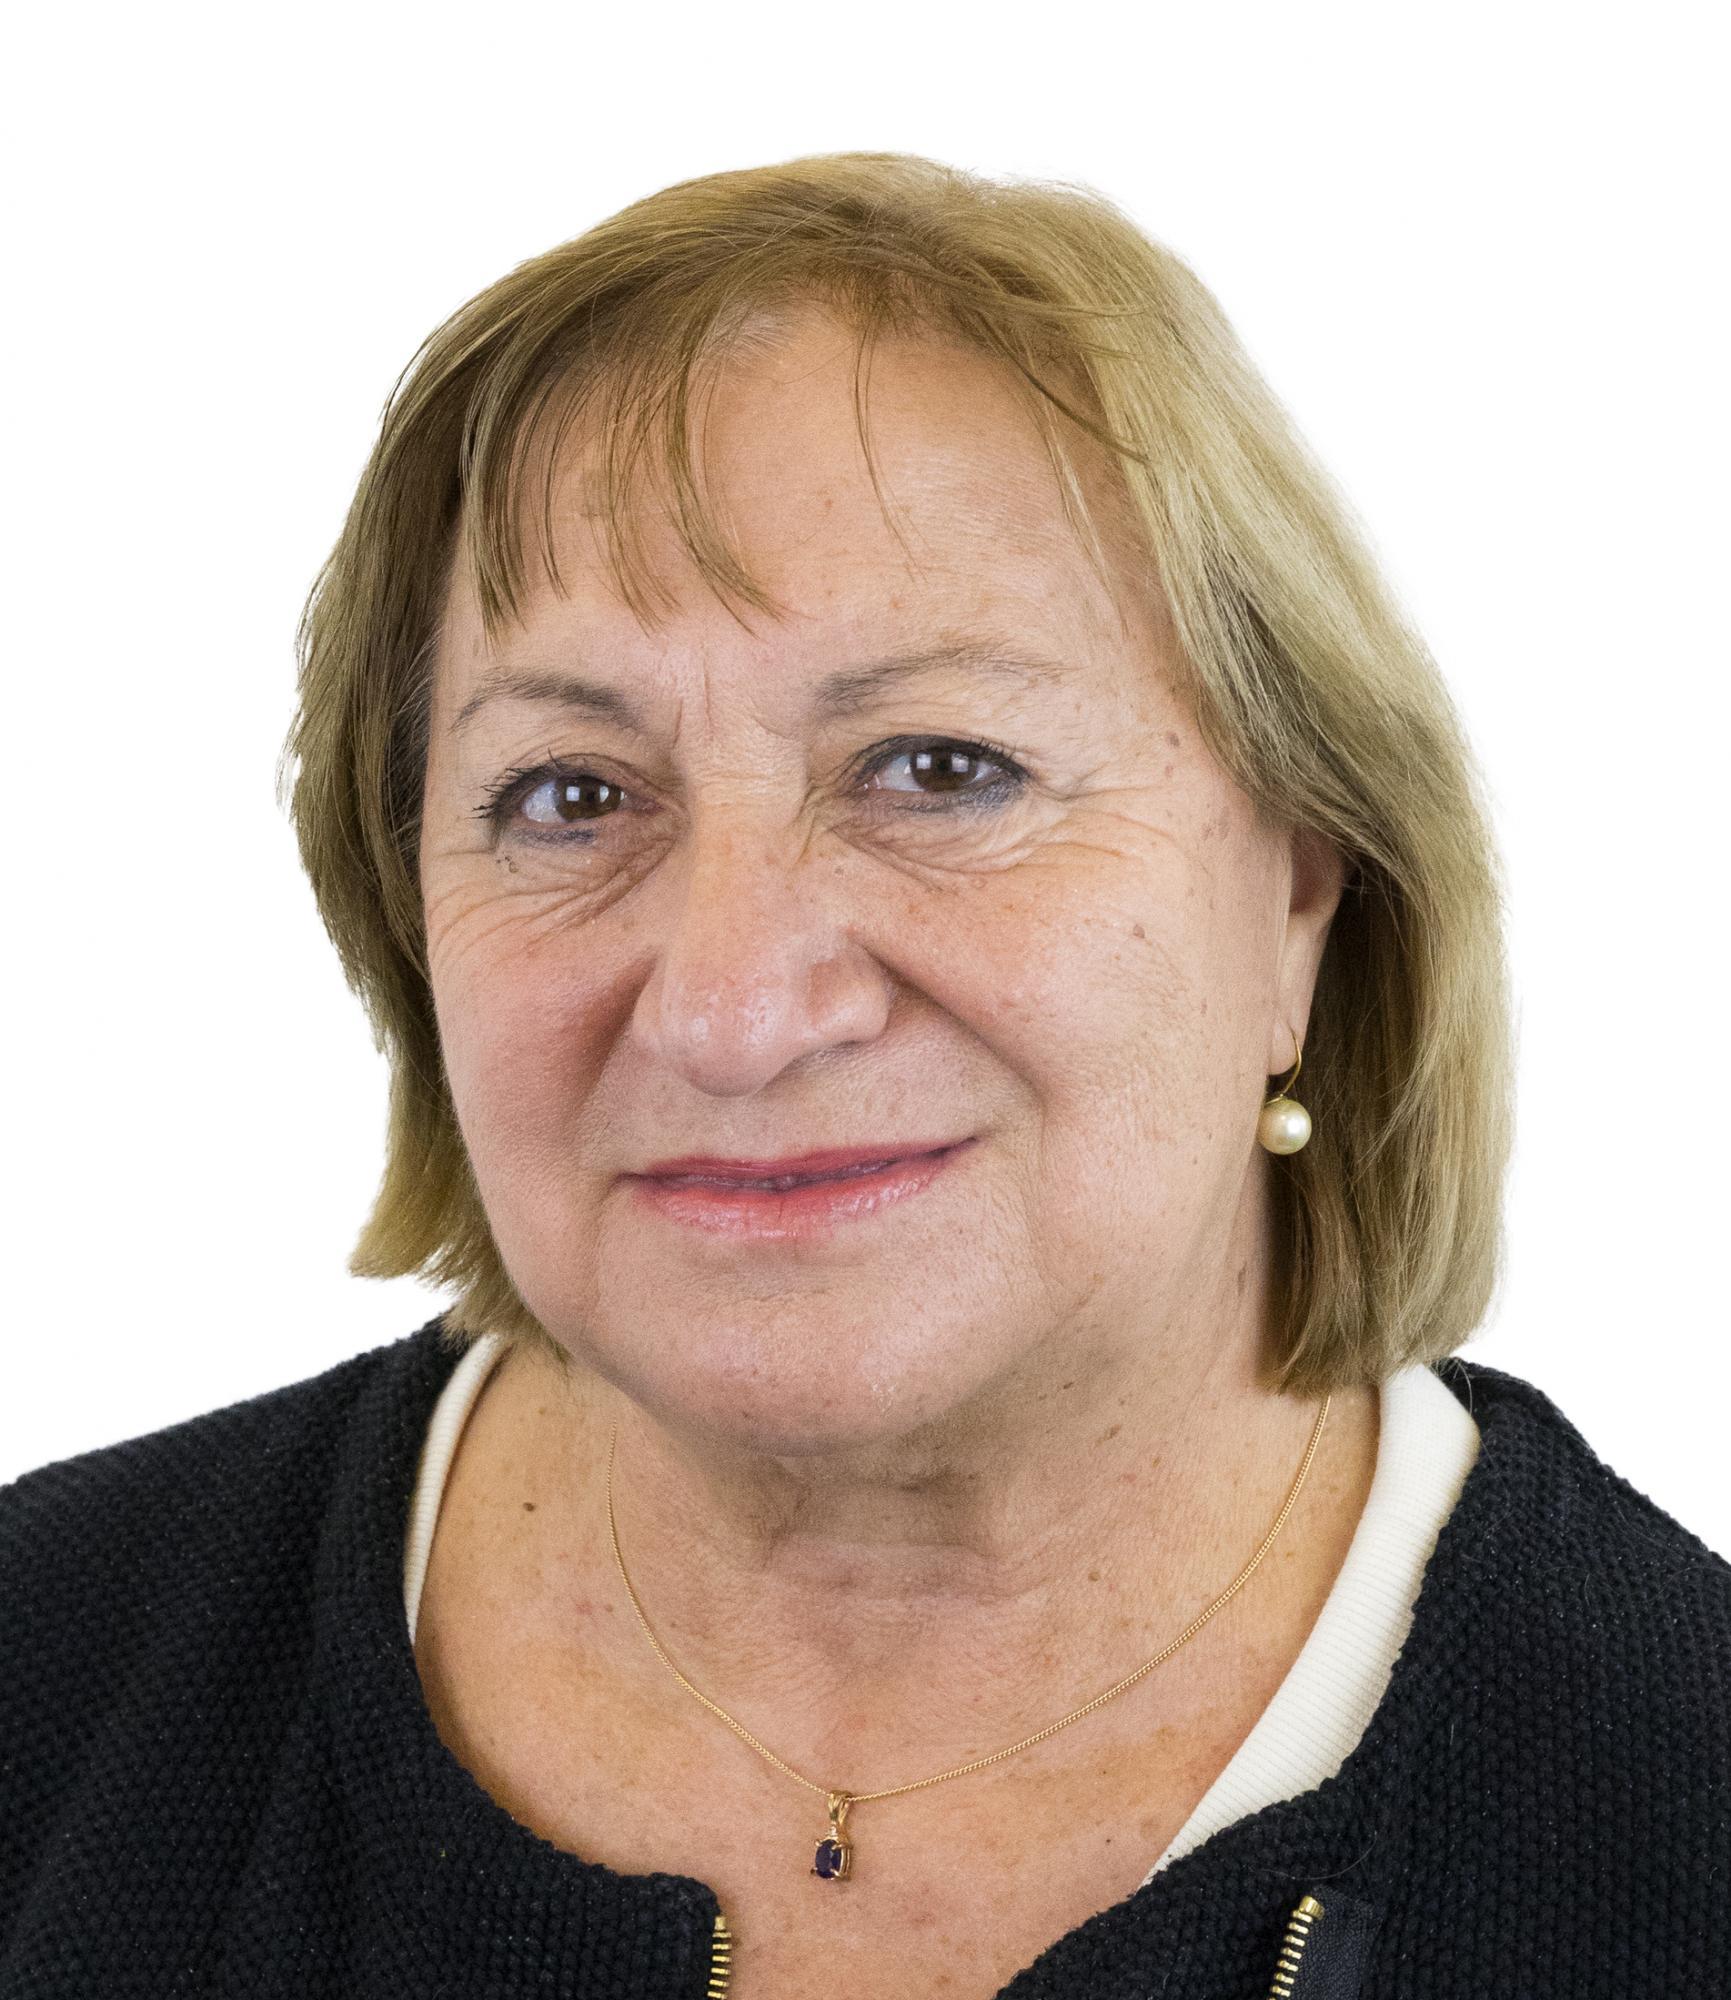 Patricia LOMBARDO - Petite enfance